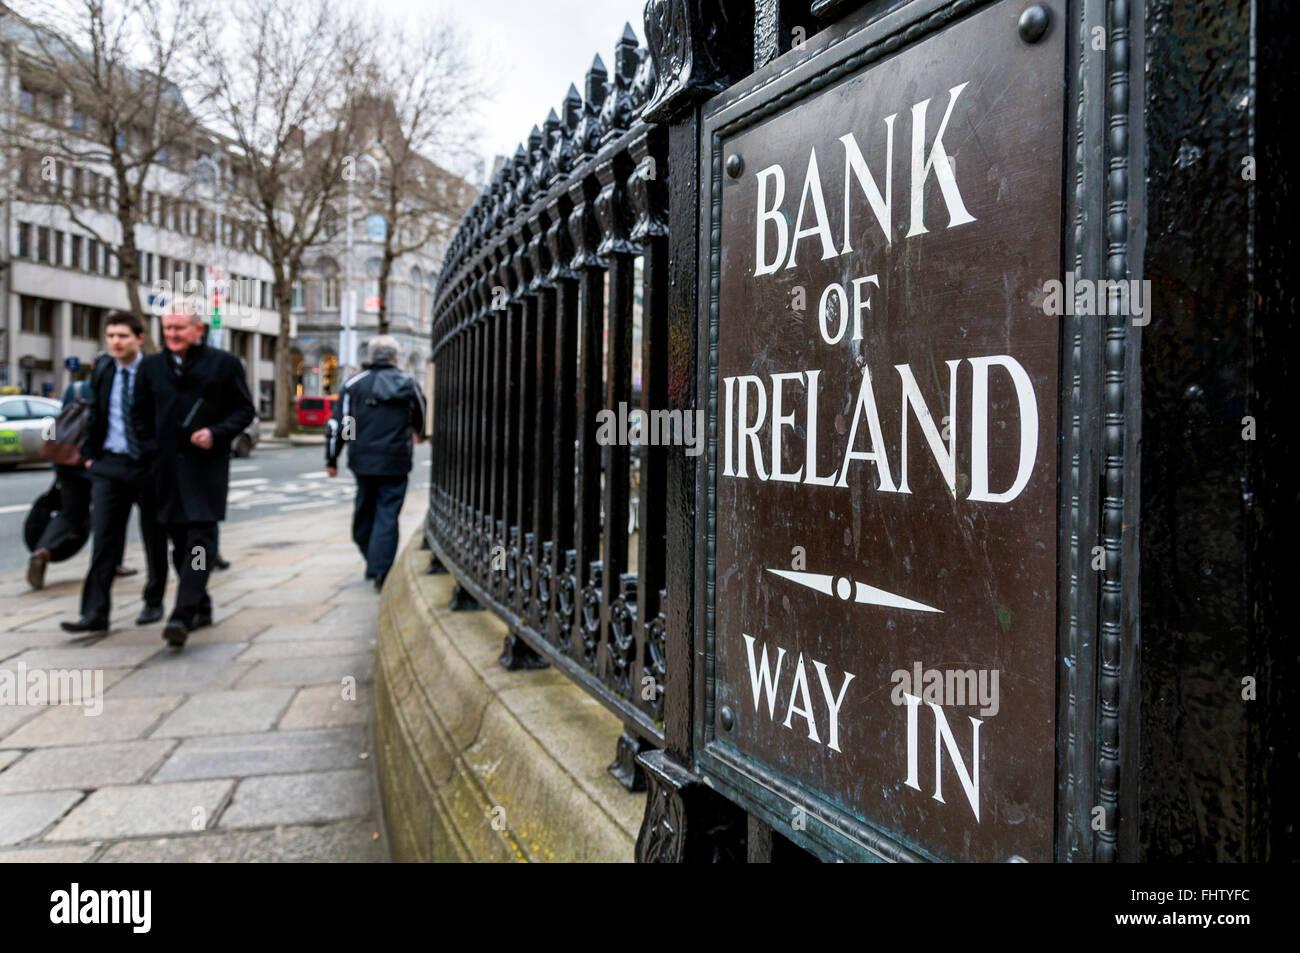 Bank of Ireland sign in Westmoreland Street, Dublin, Ireland - Stock Image